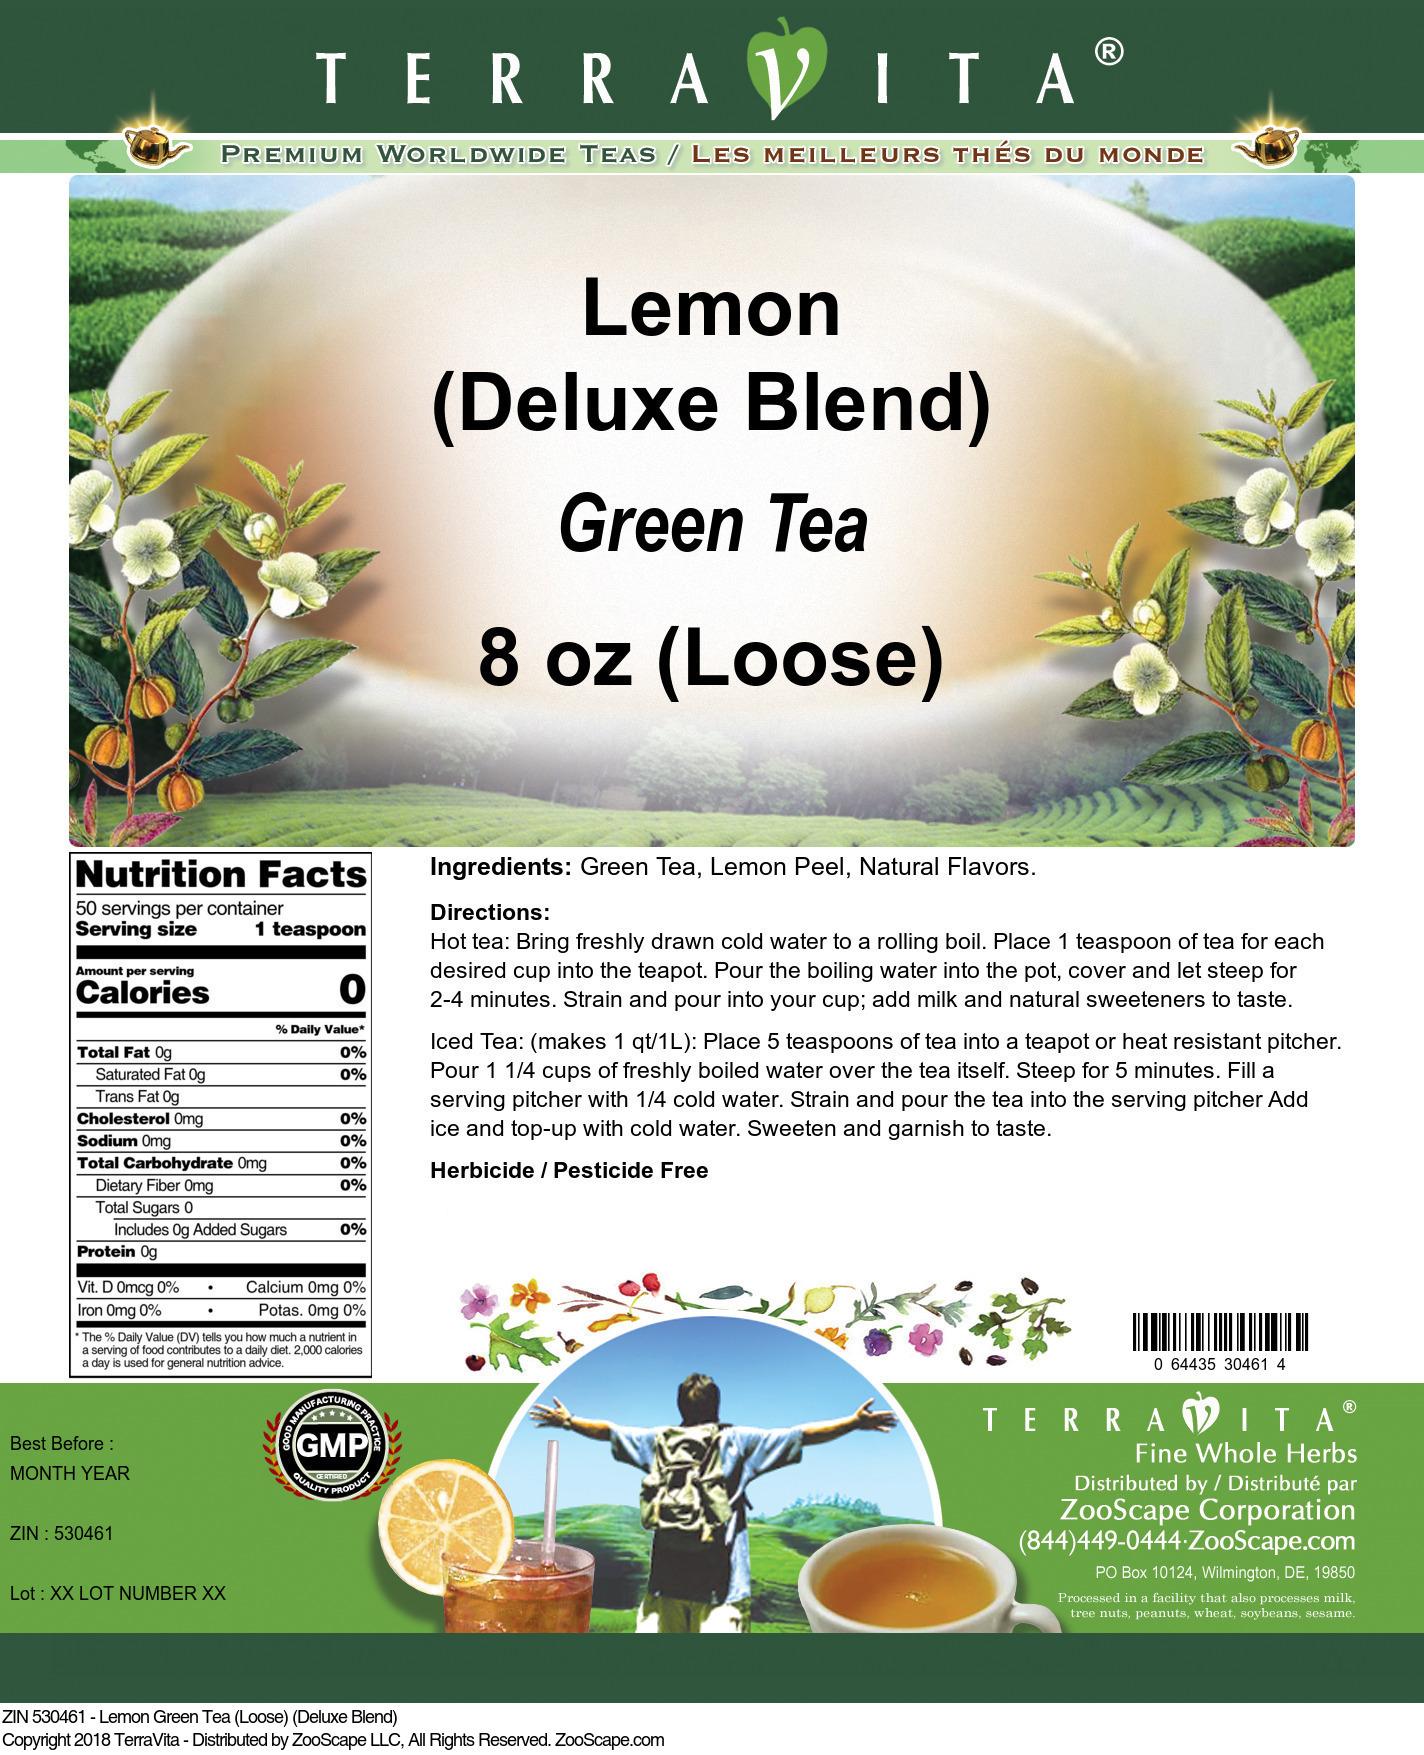 Lemon Green Tea (Loose) (Deluxe Blend)